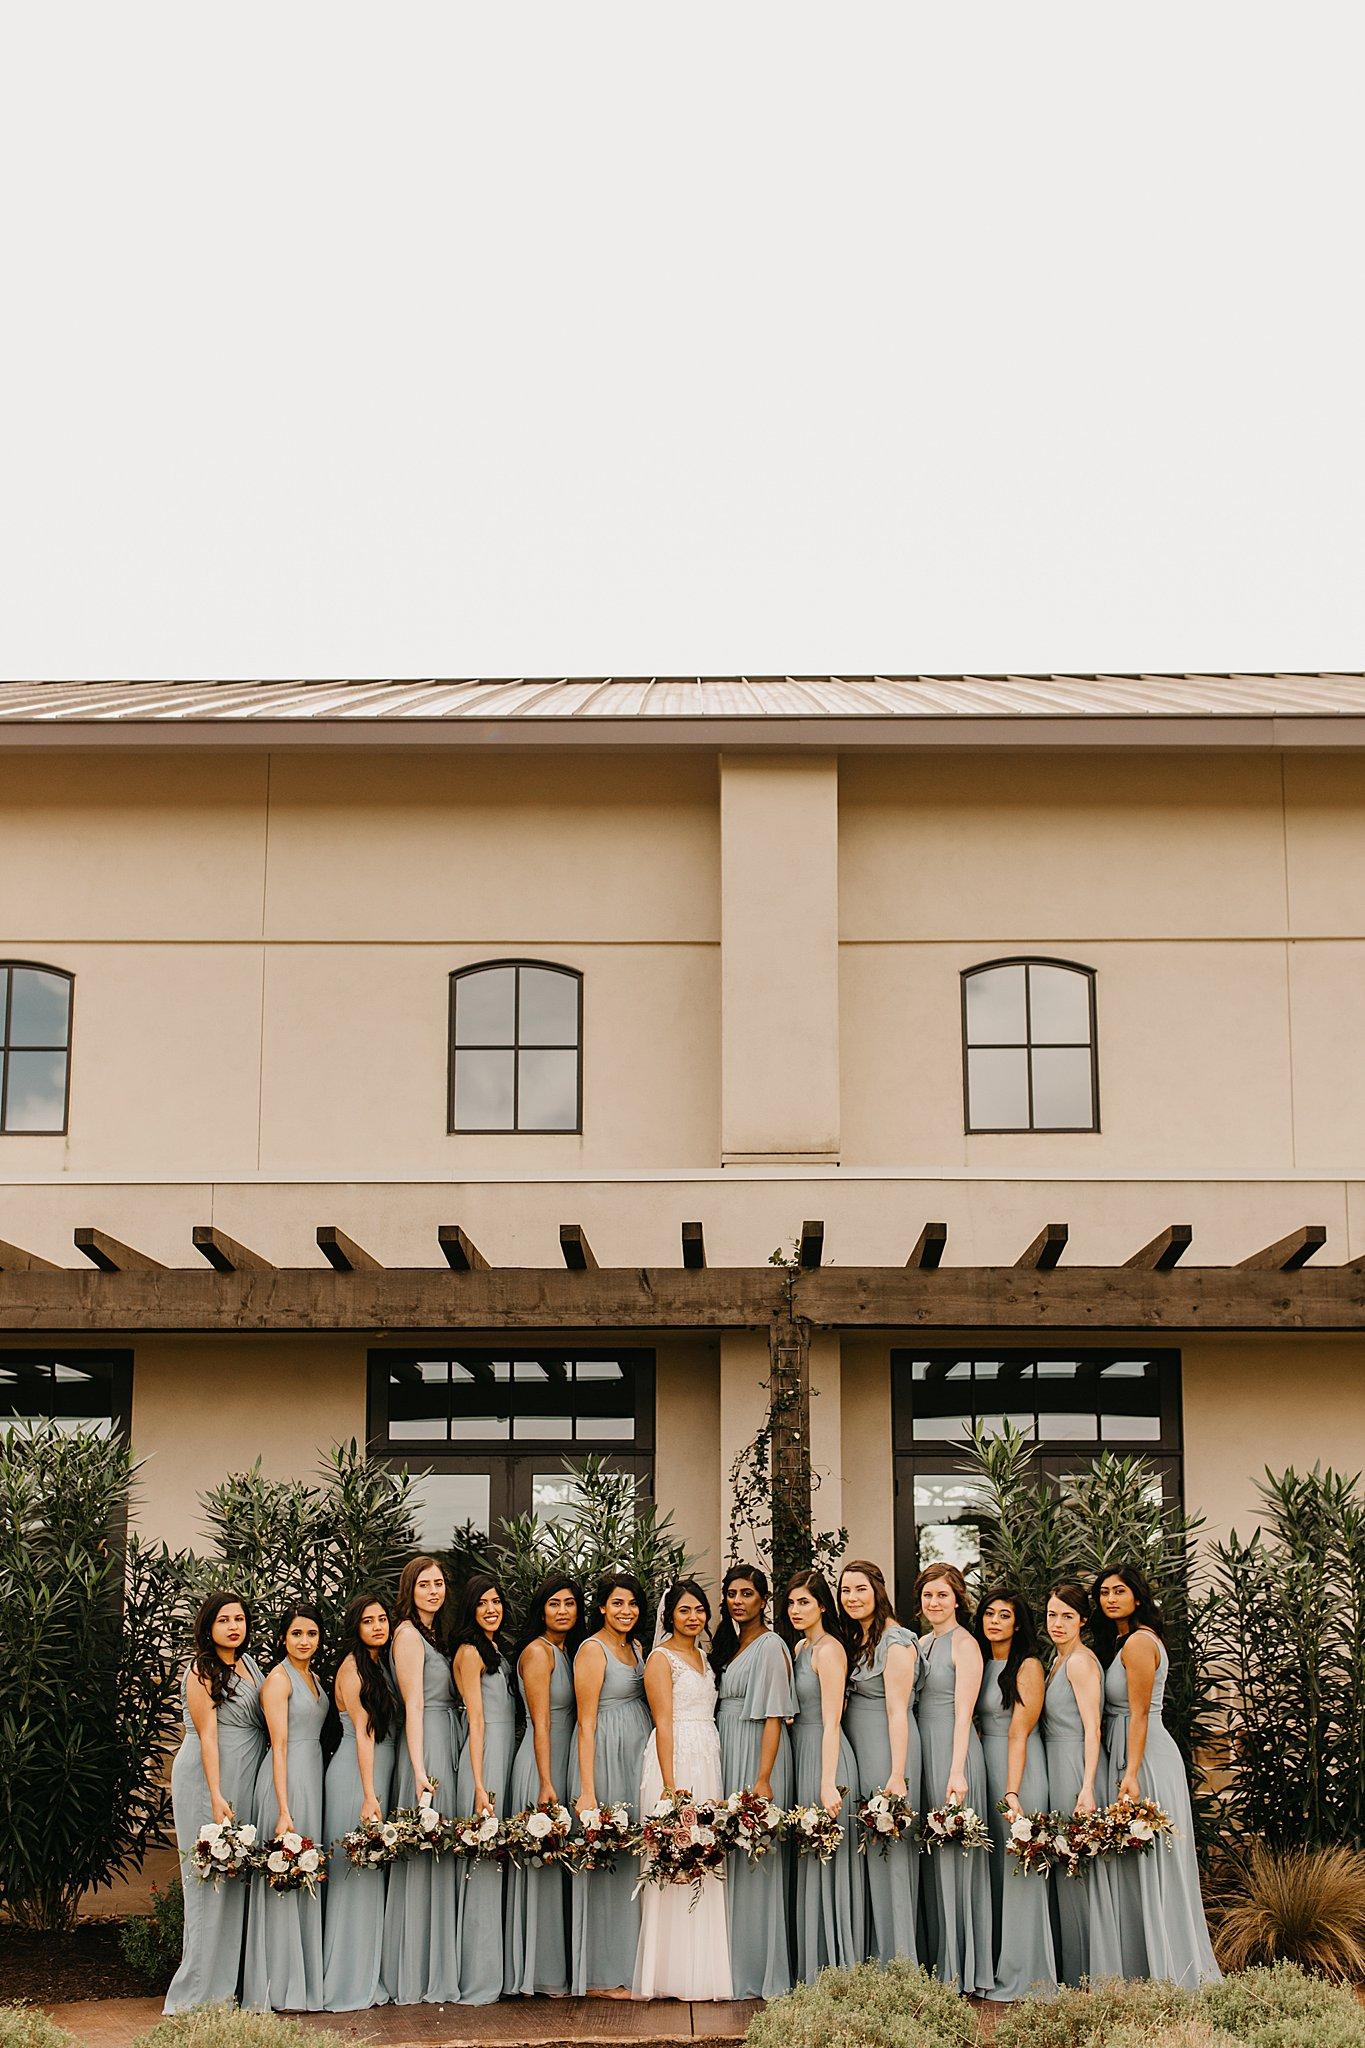 Wilderlove Co_Dripping Springs Texas_Texas Hill Country Wedding_Photography_0019.jpg